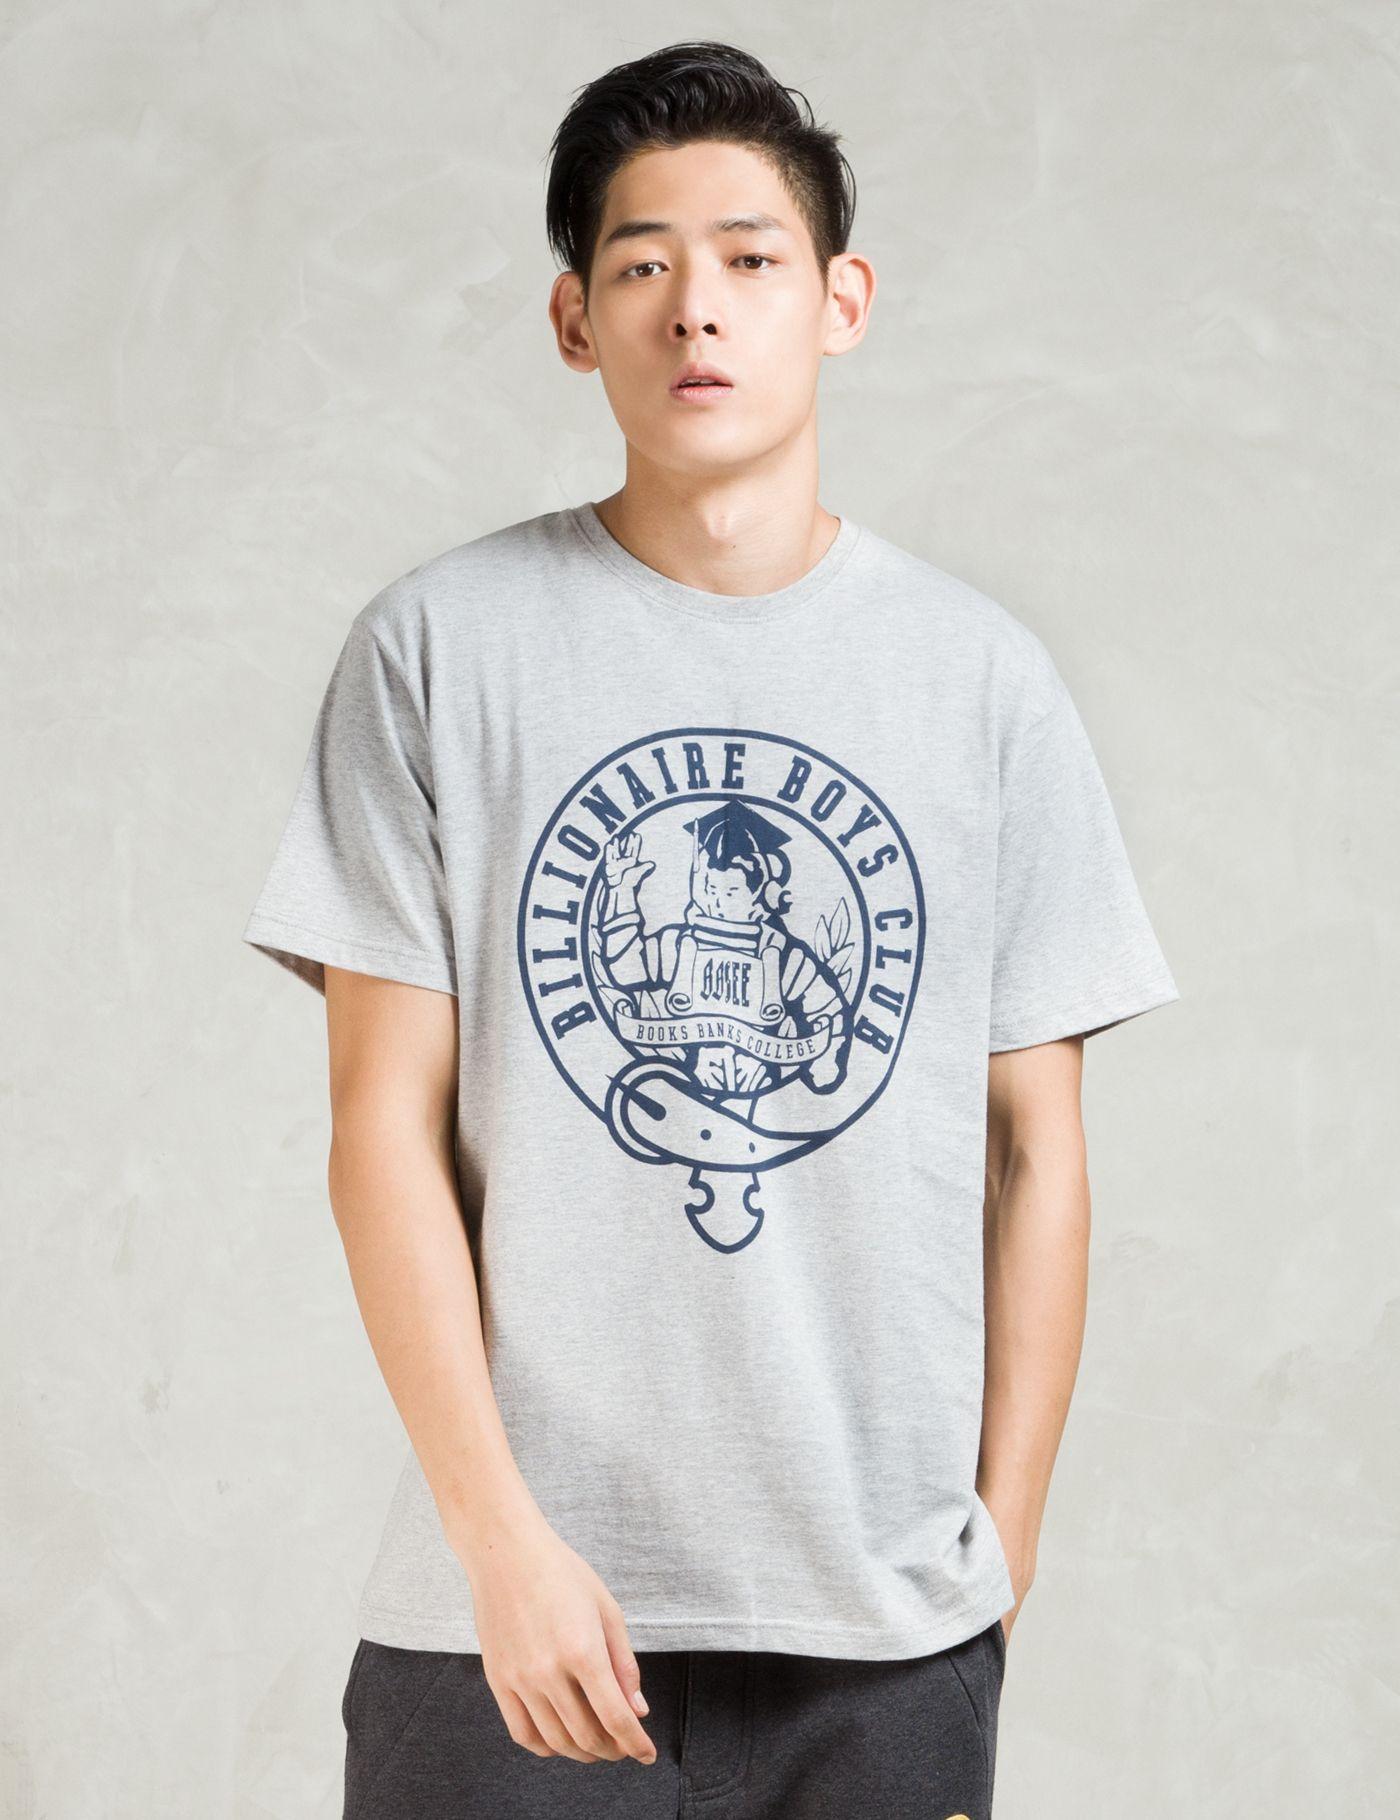 Billionaire Boys Club Grey Sscn Astro College T-Shirt | HBX.